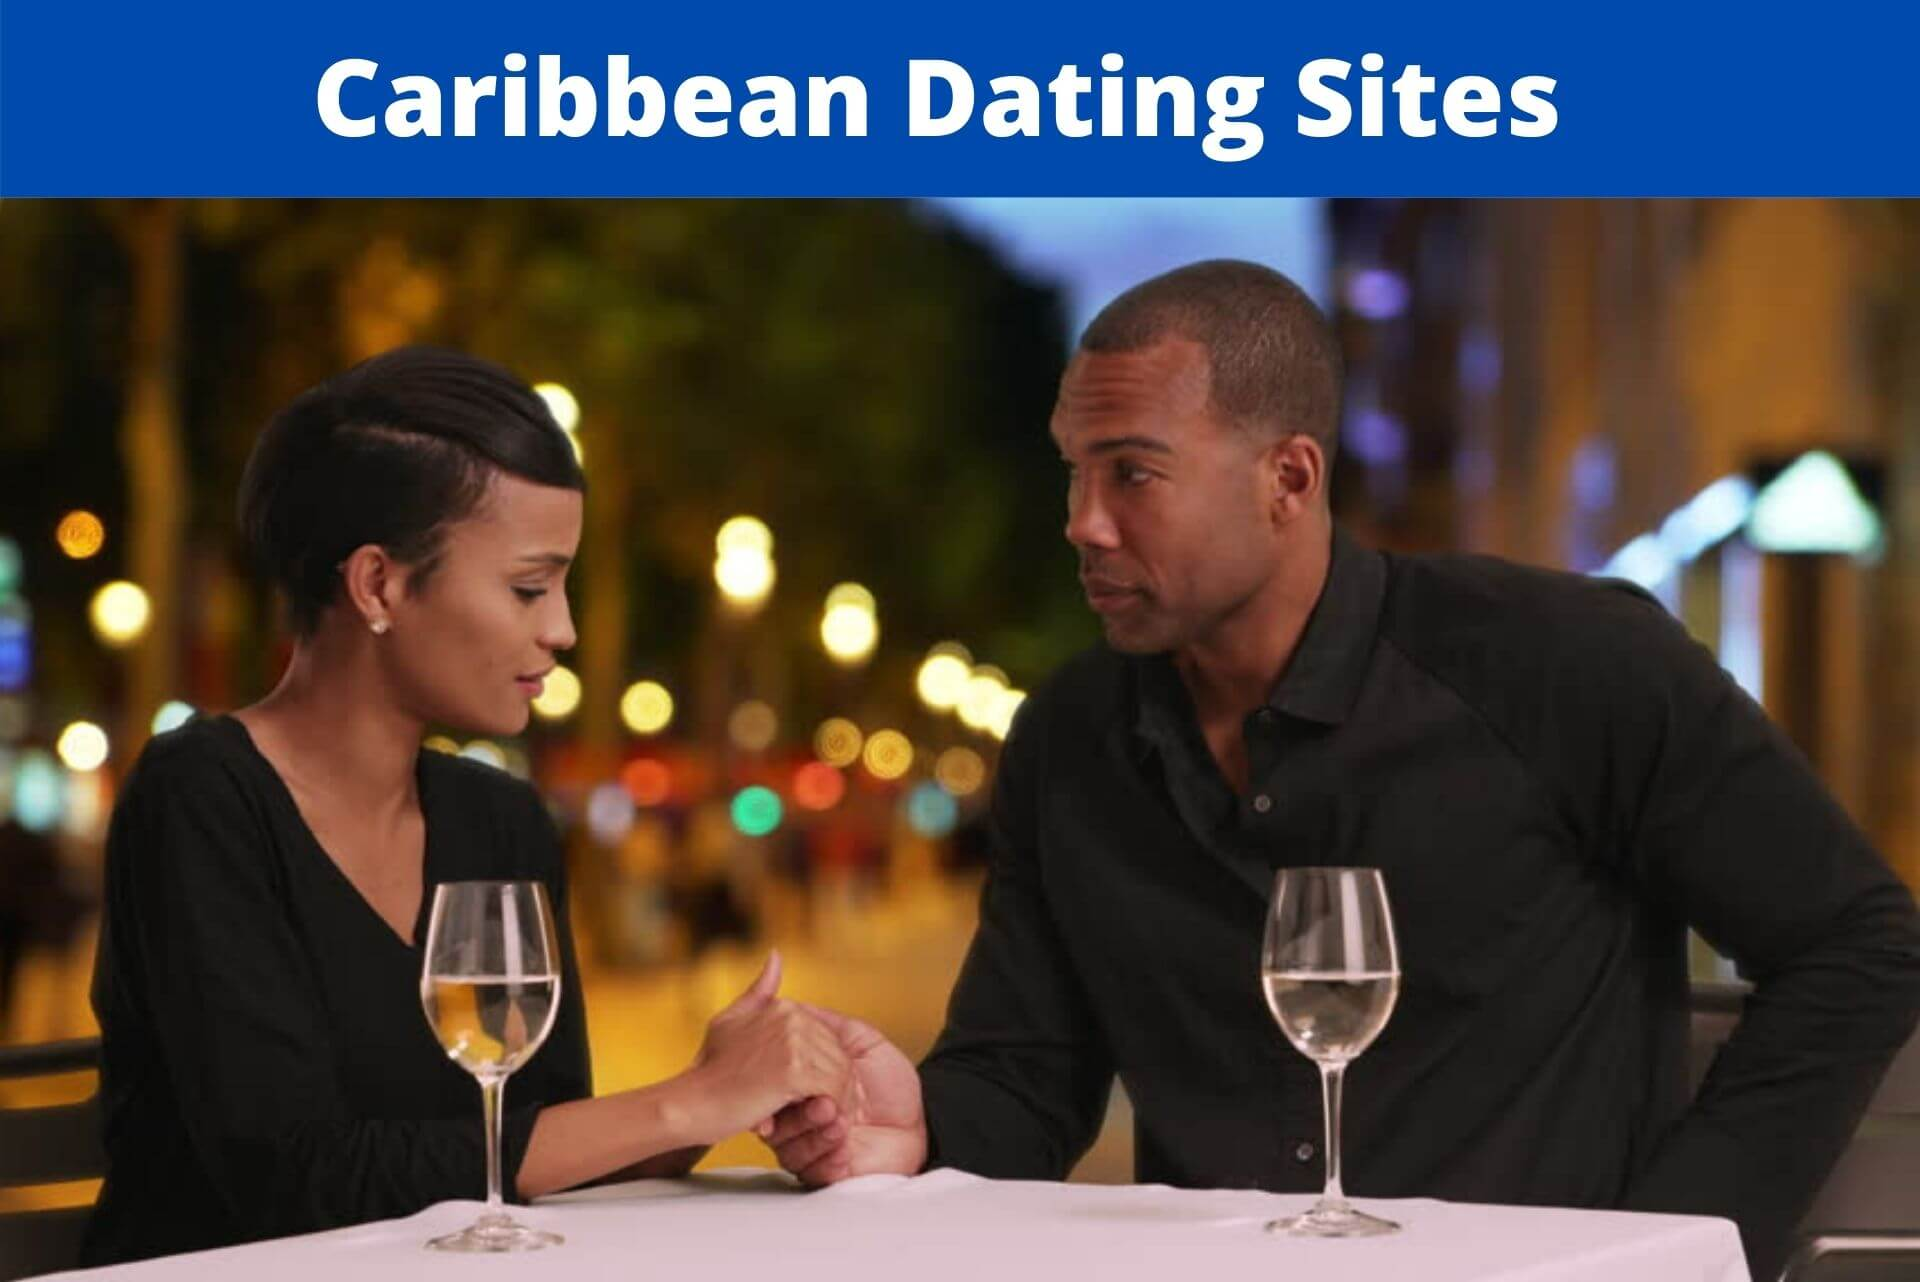 Caribbean Dating Sites